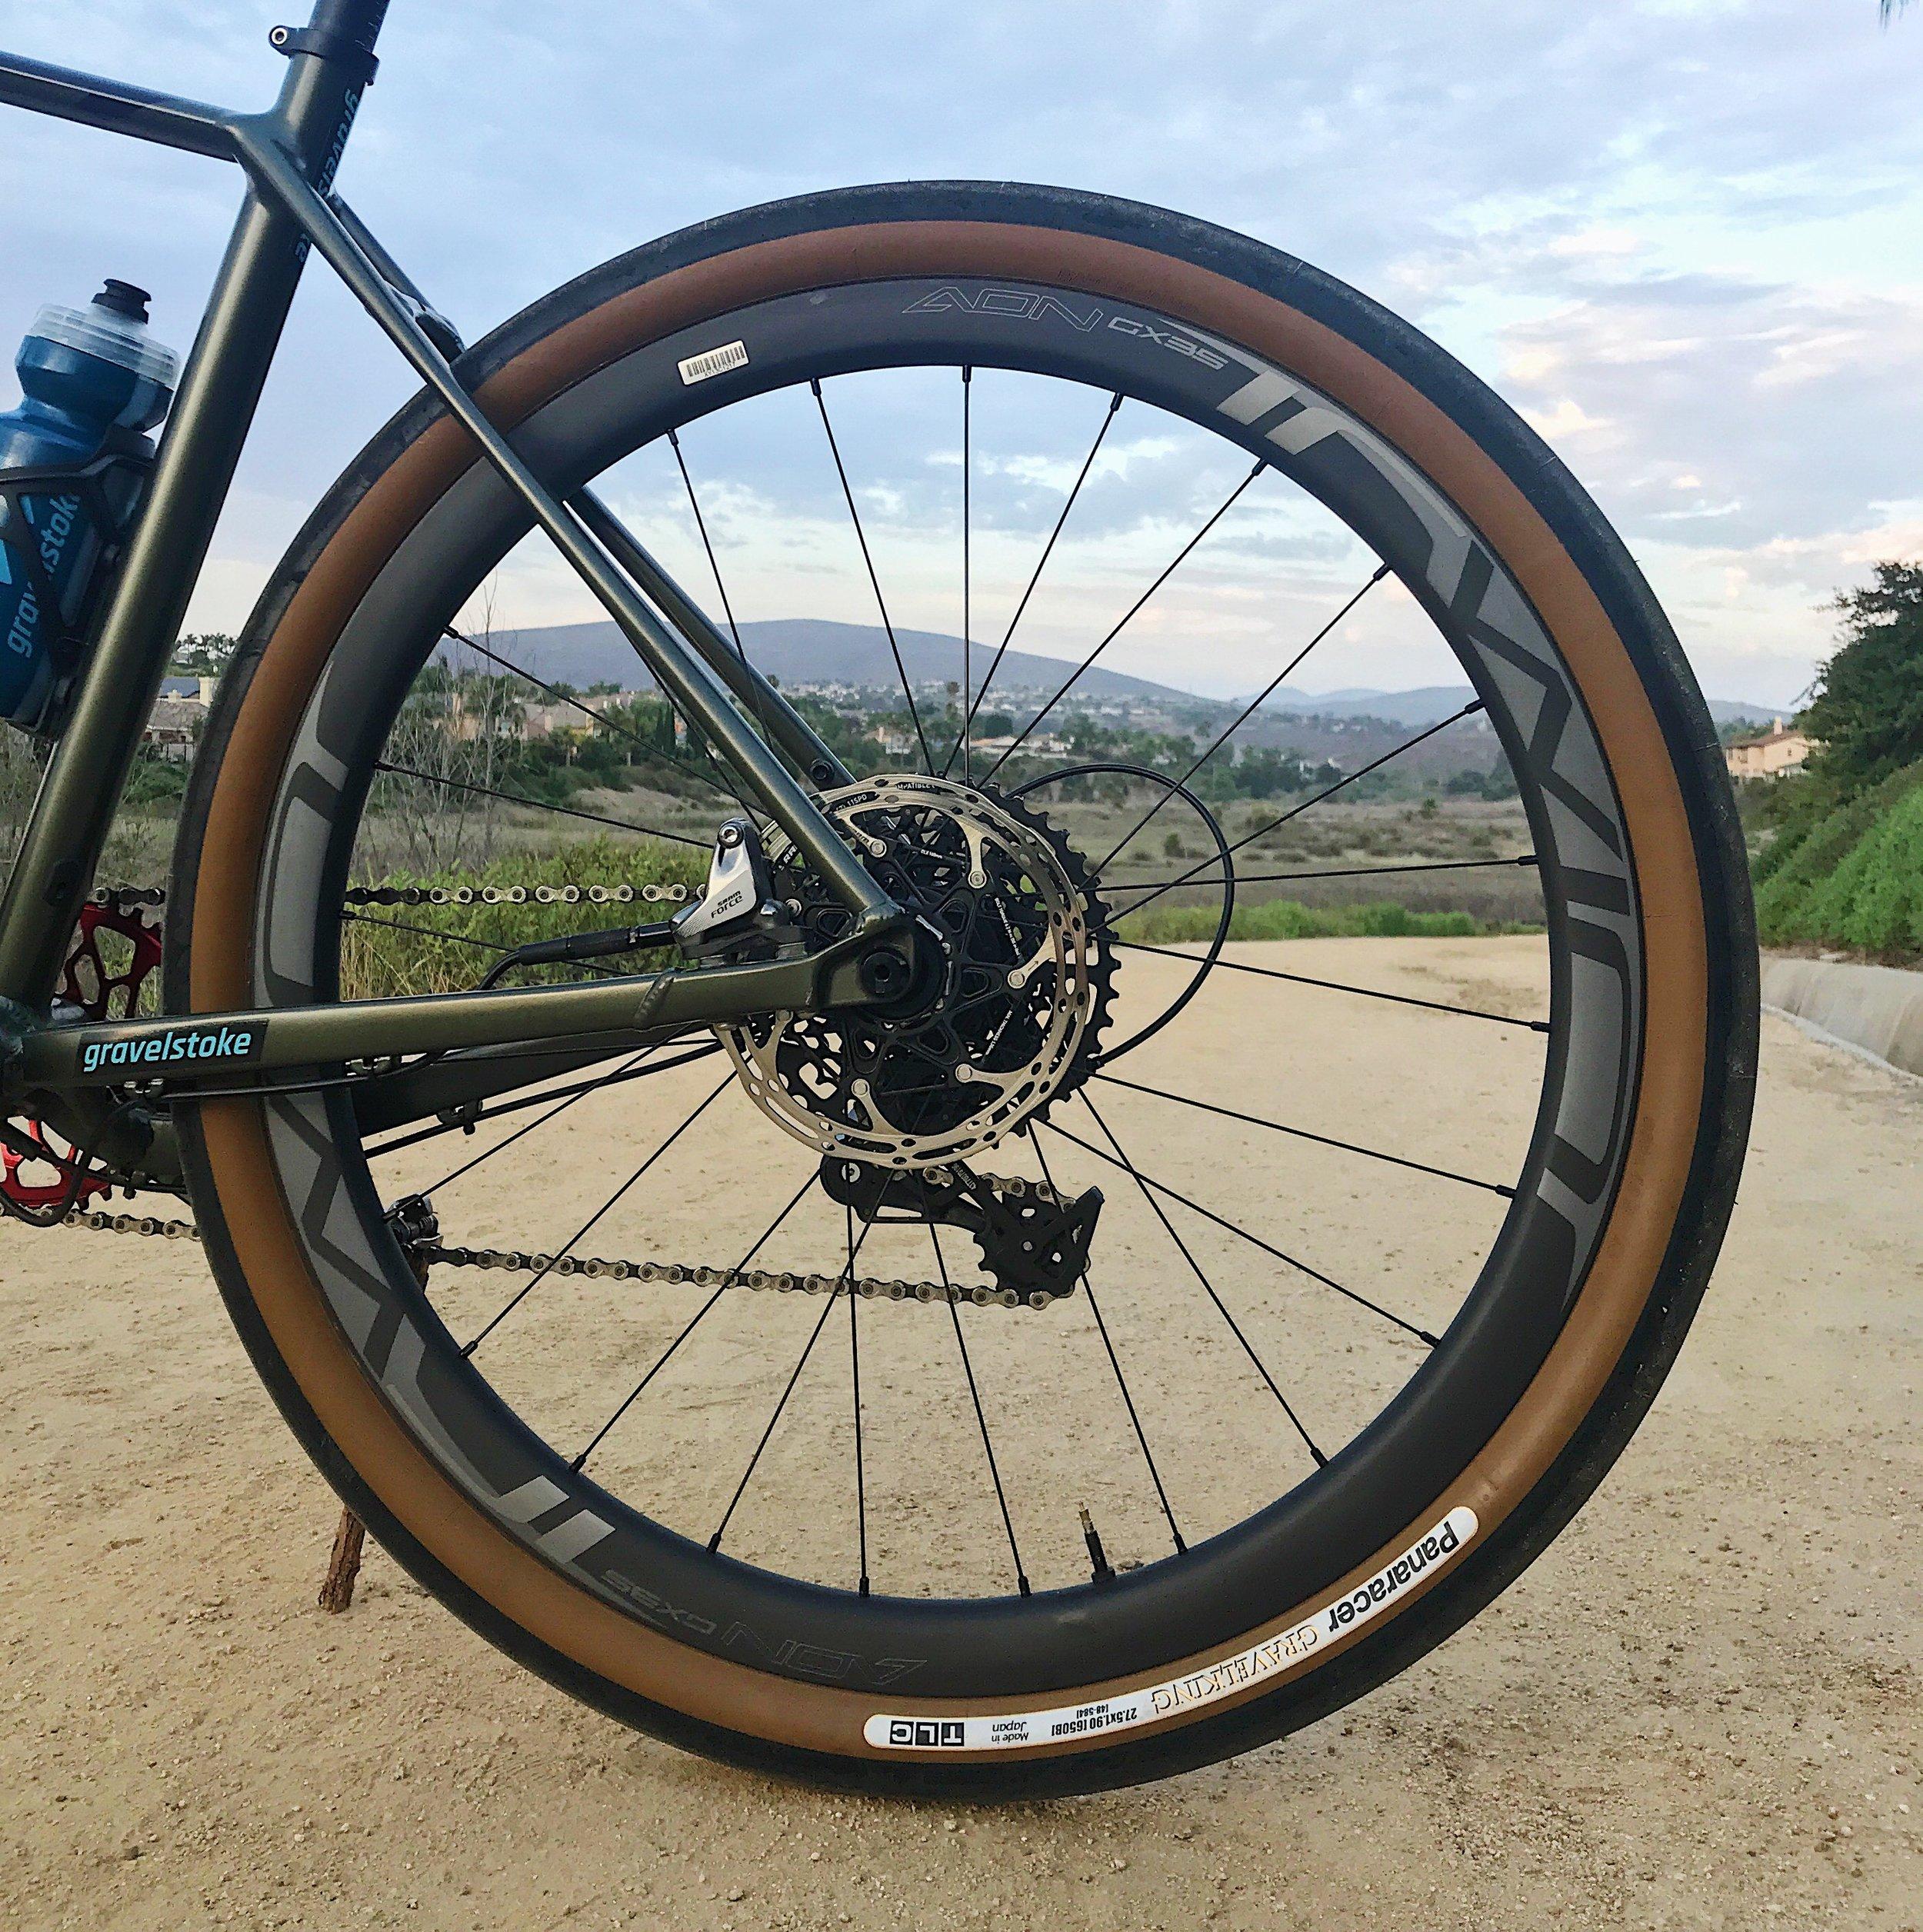 aon gx35 gravel wheels.jpg